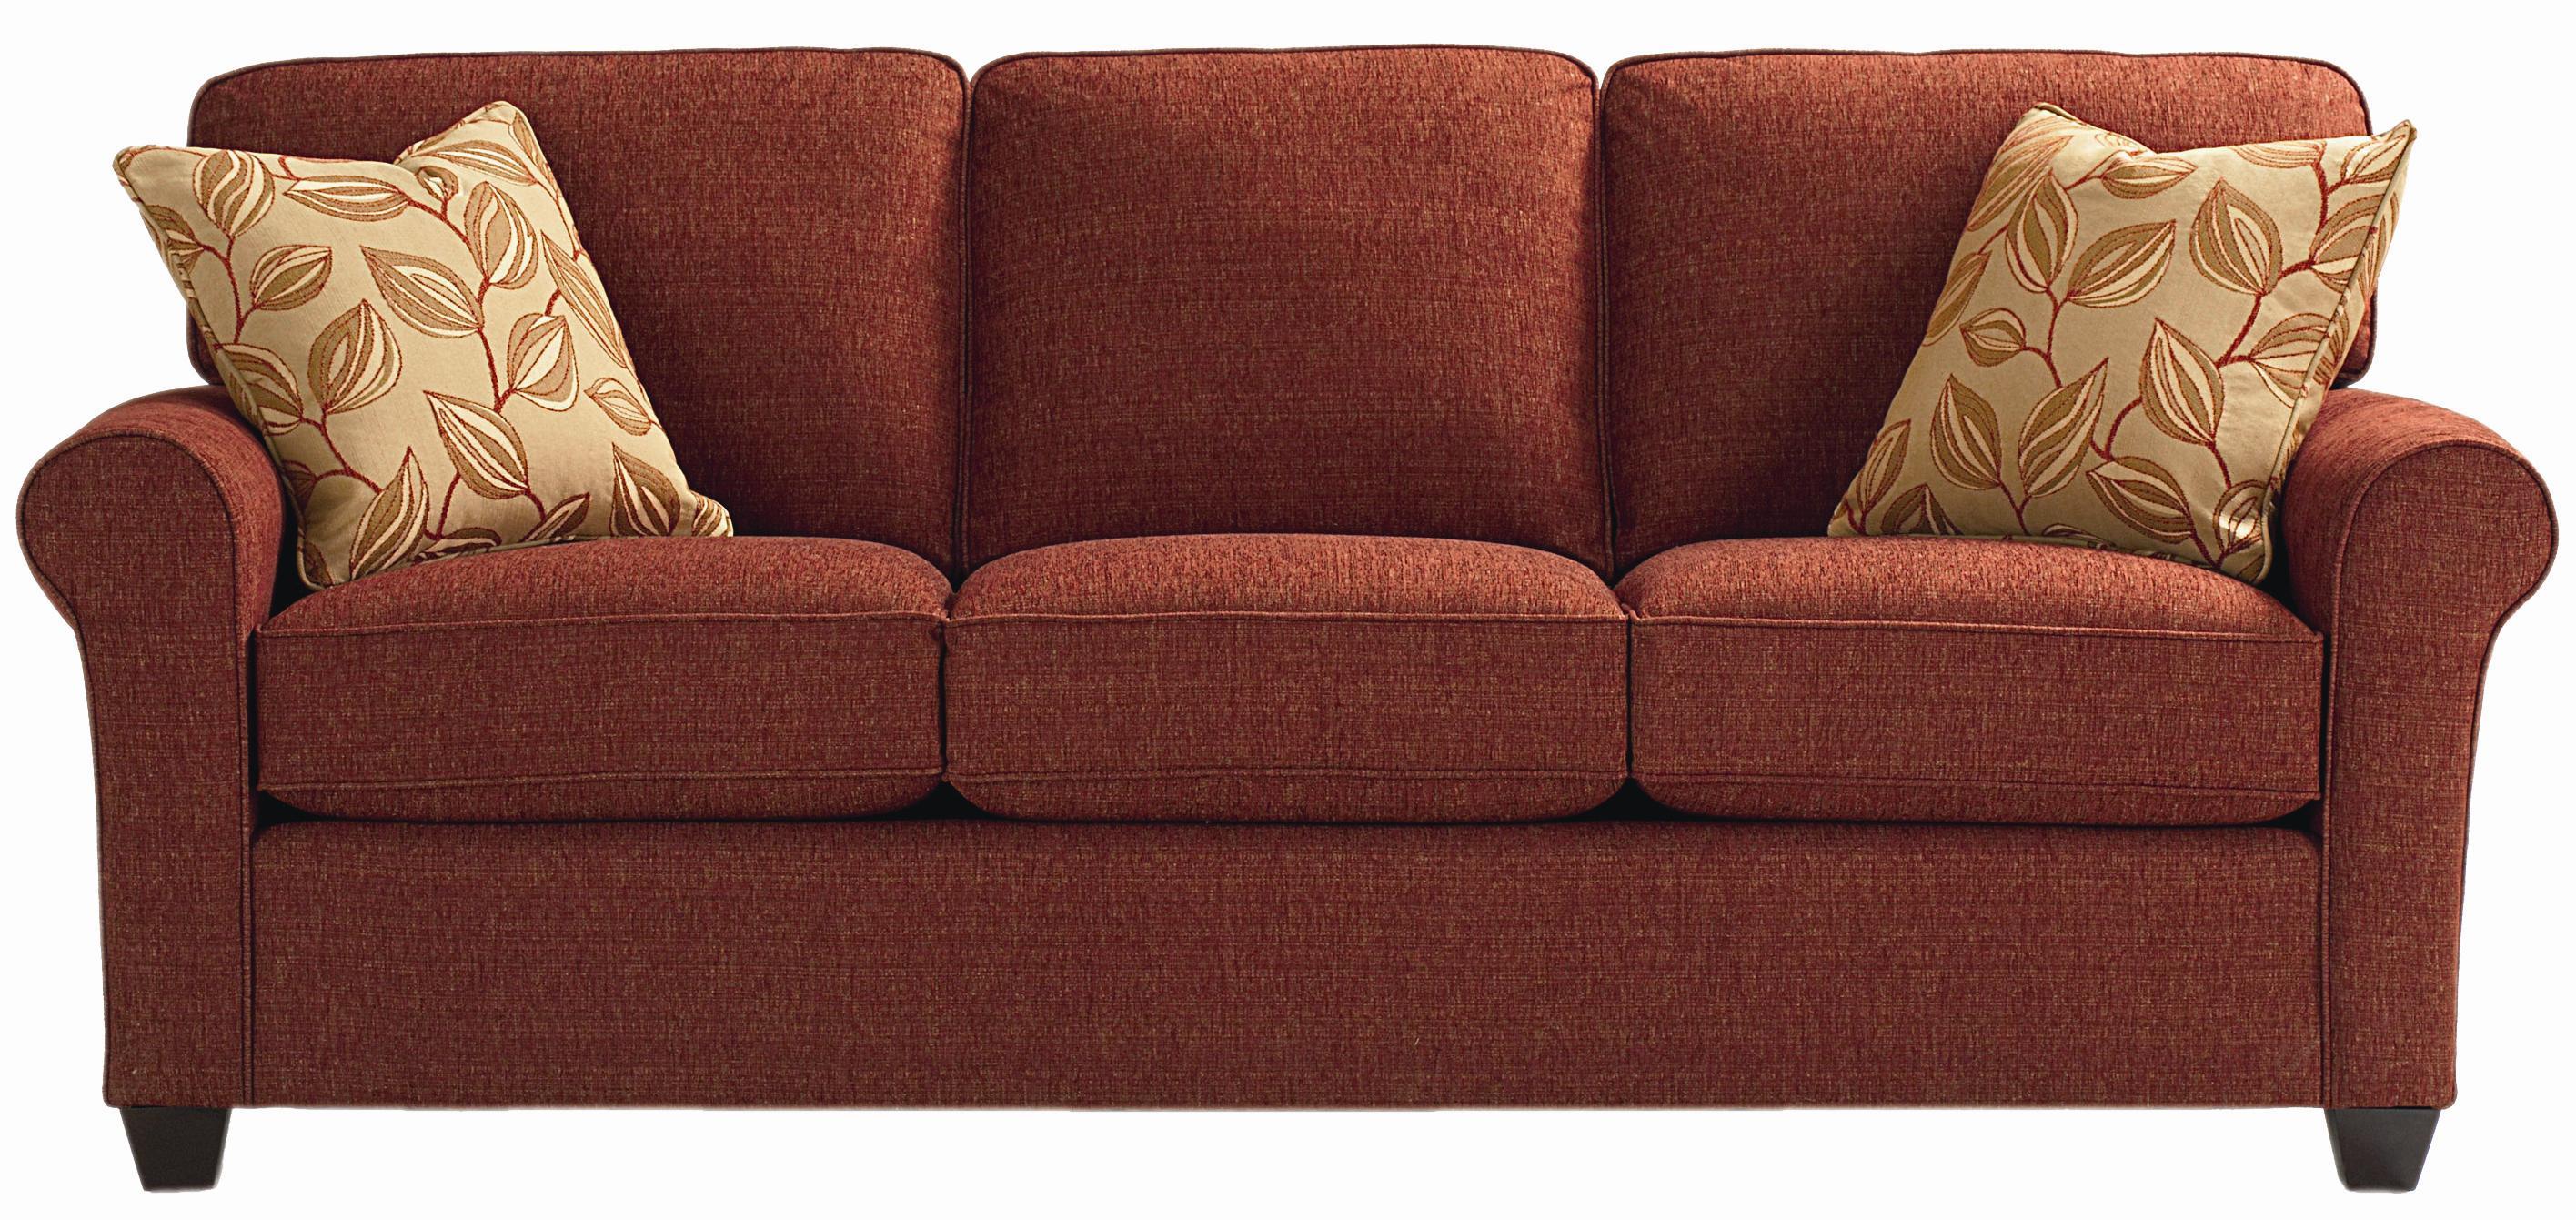 Attirant Bassett Upholstered Sofa ...